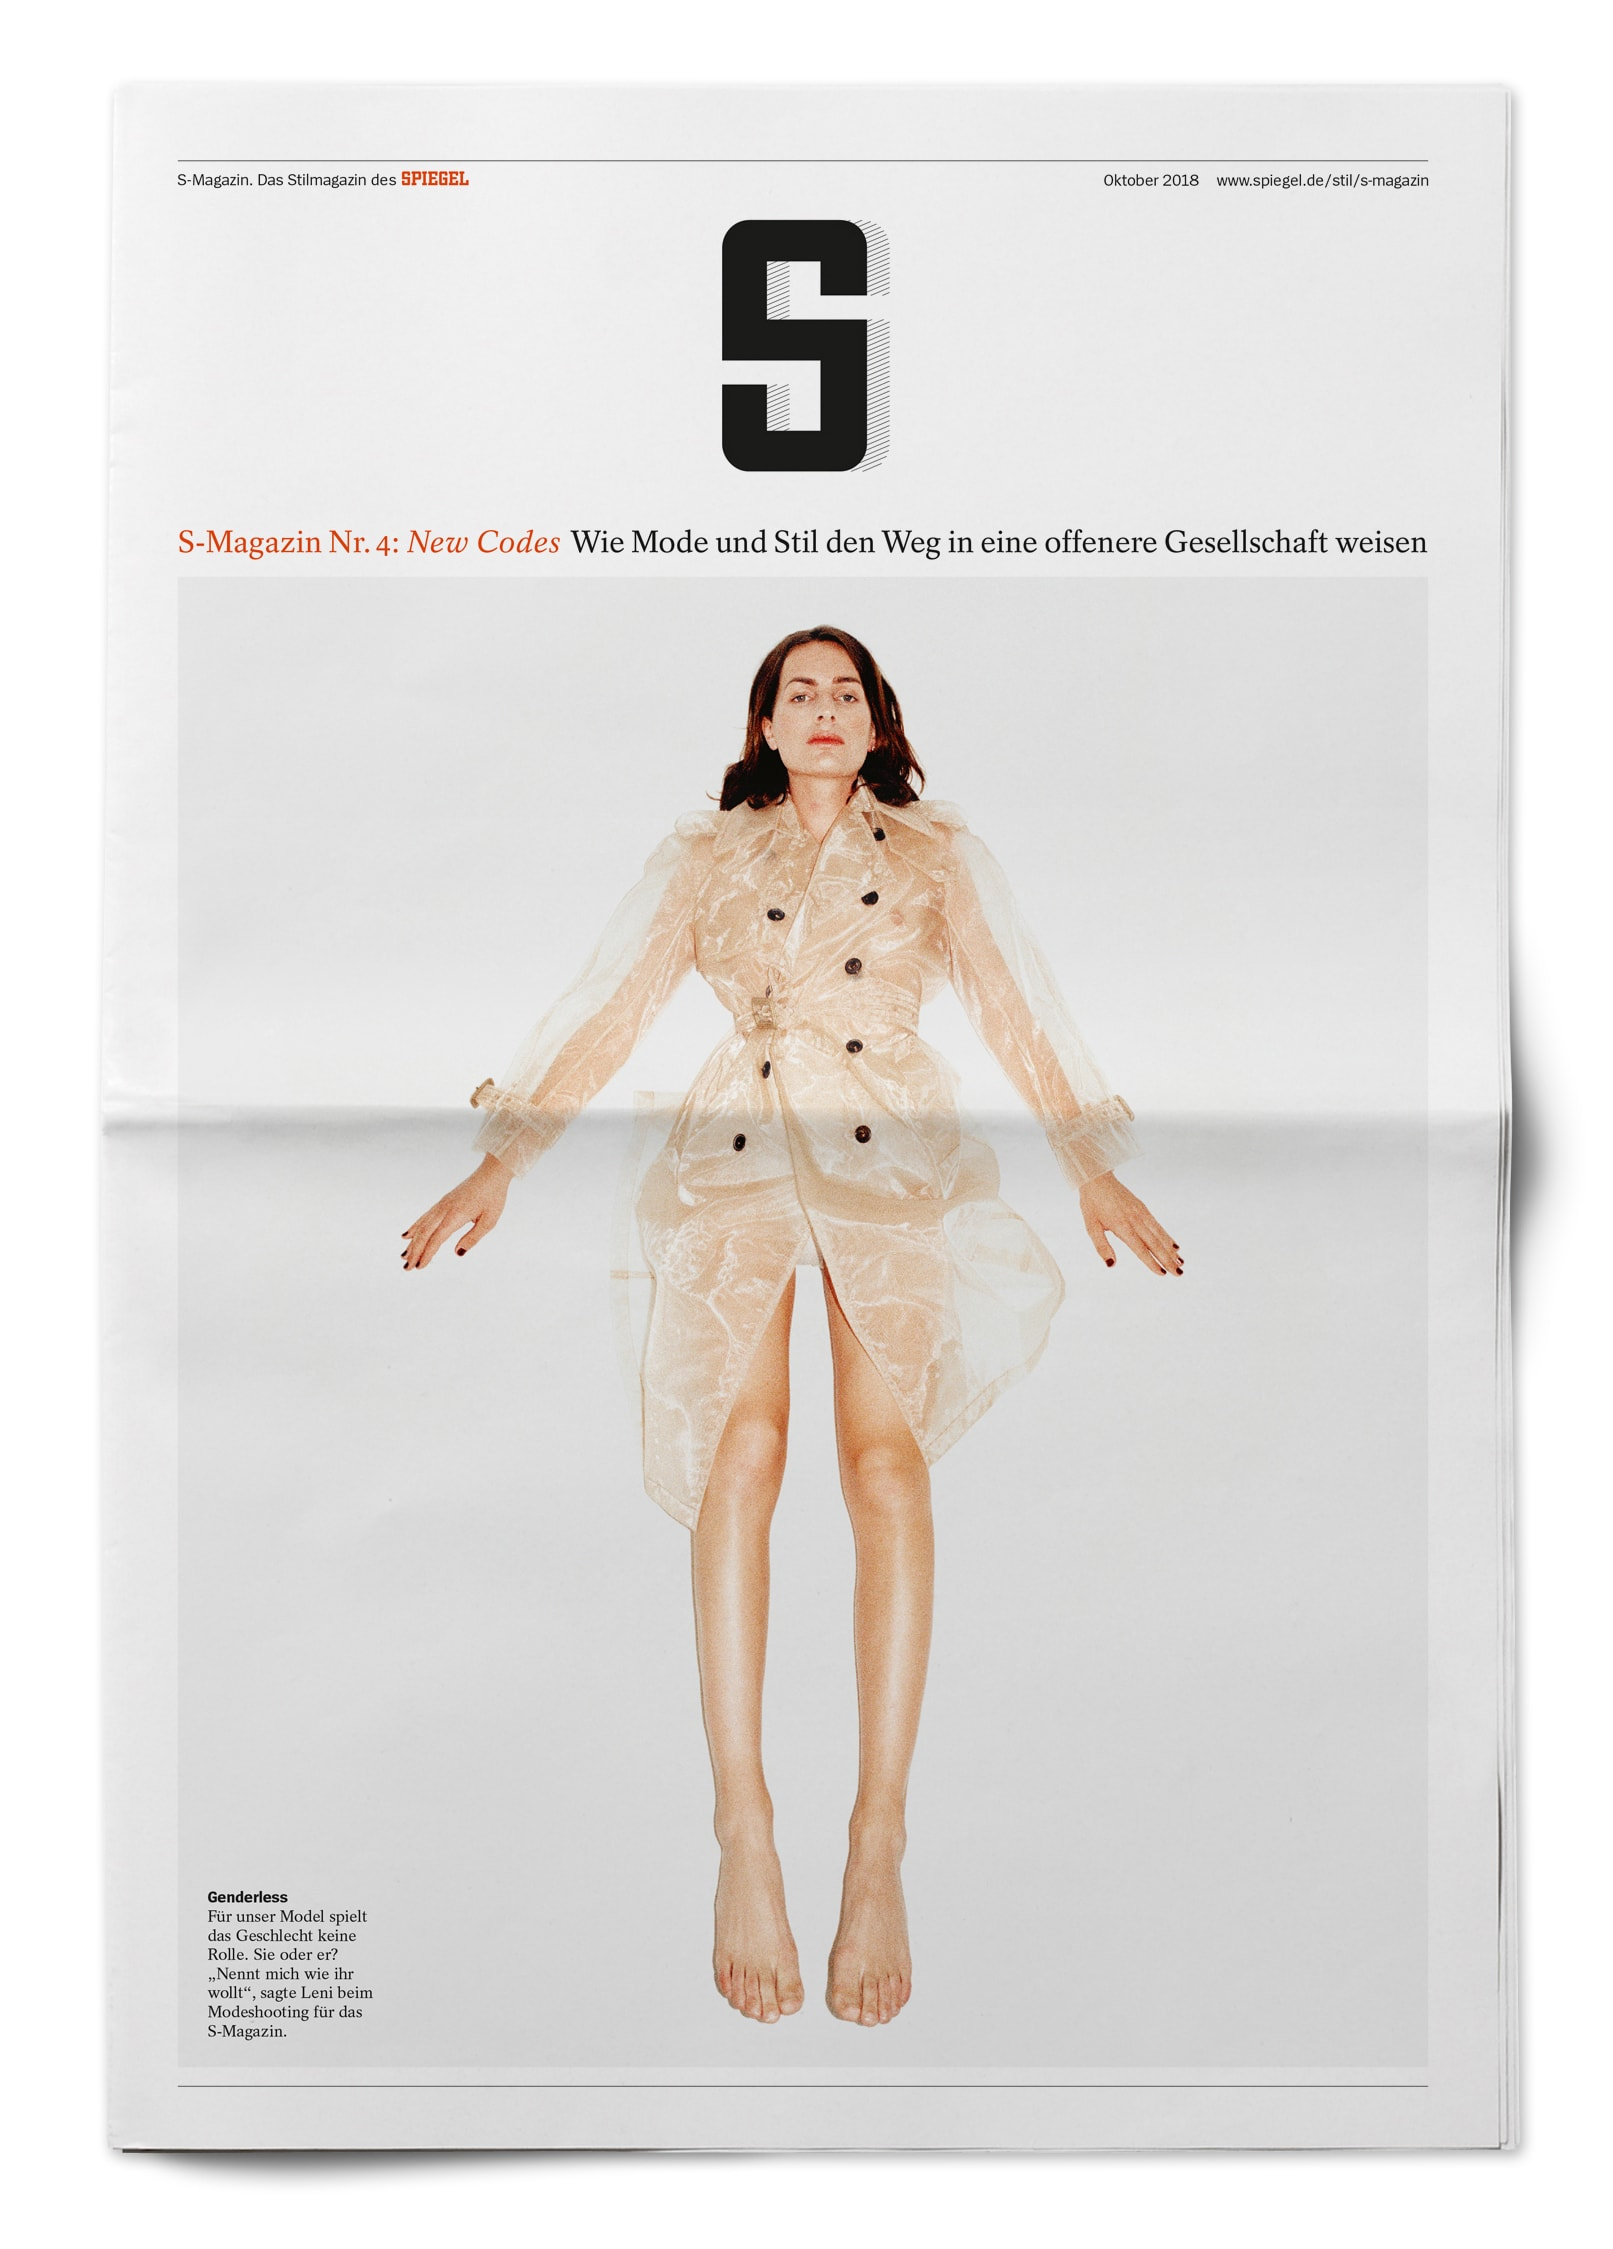 Bureau Johannes Erler – S-Magazin Nr.4: New Codes